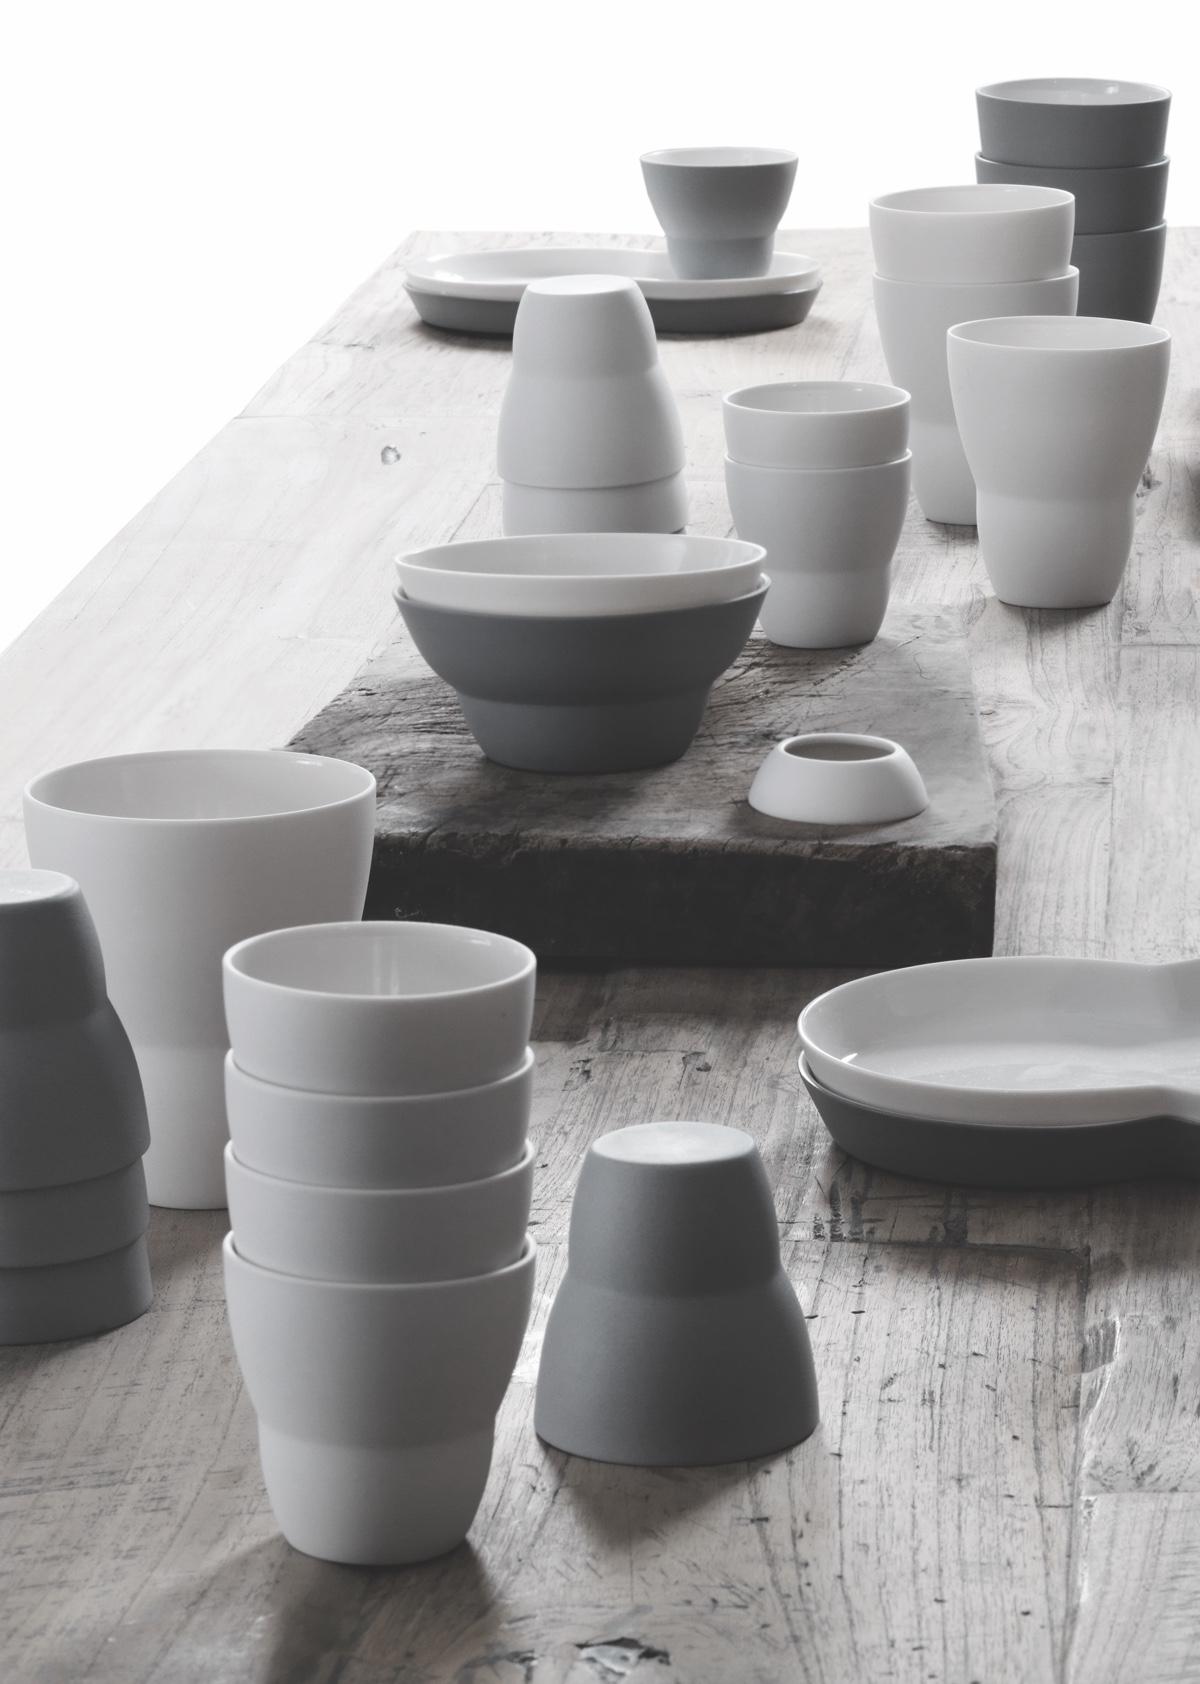 Vipp'sceramic collection was developed in collaboration with Danish ceramicist Annemette Kissow.